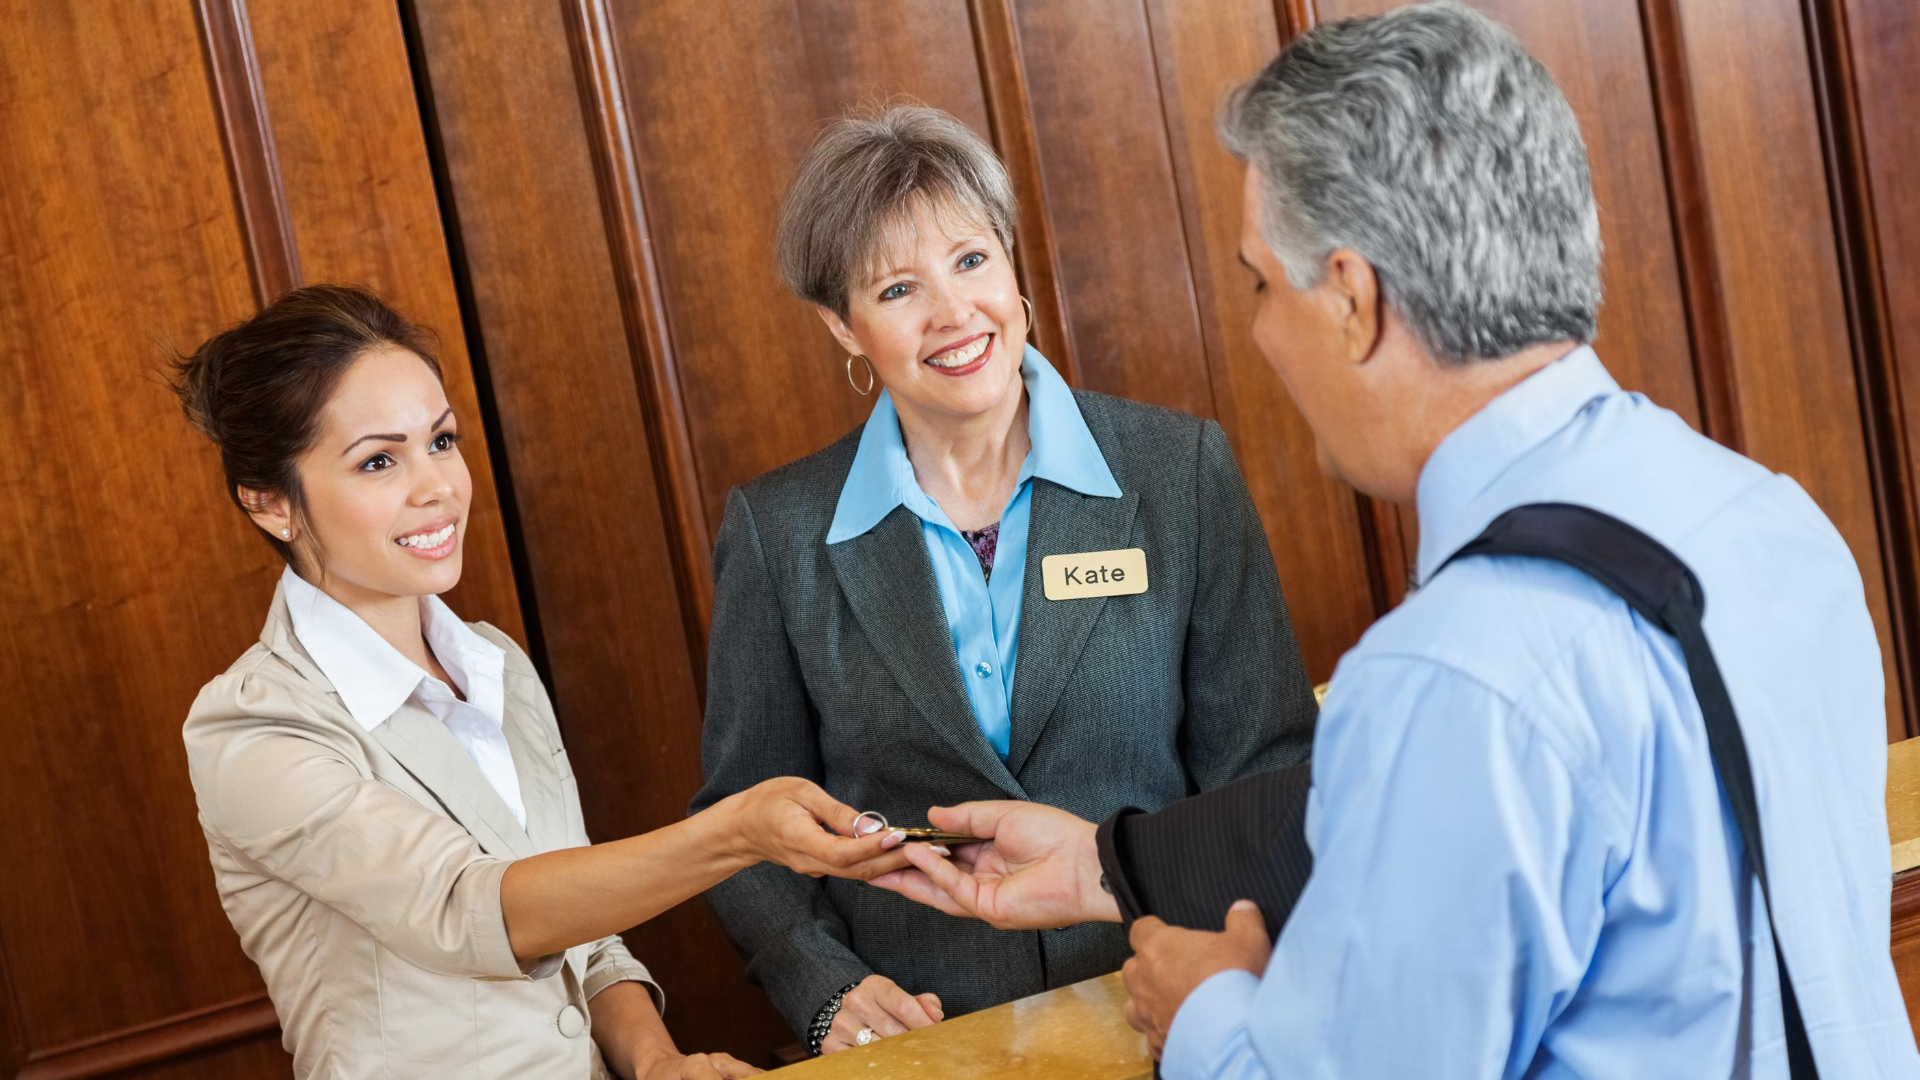 Communication Skills in Hotel